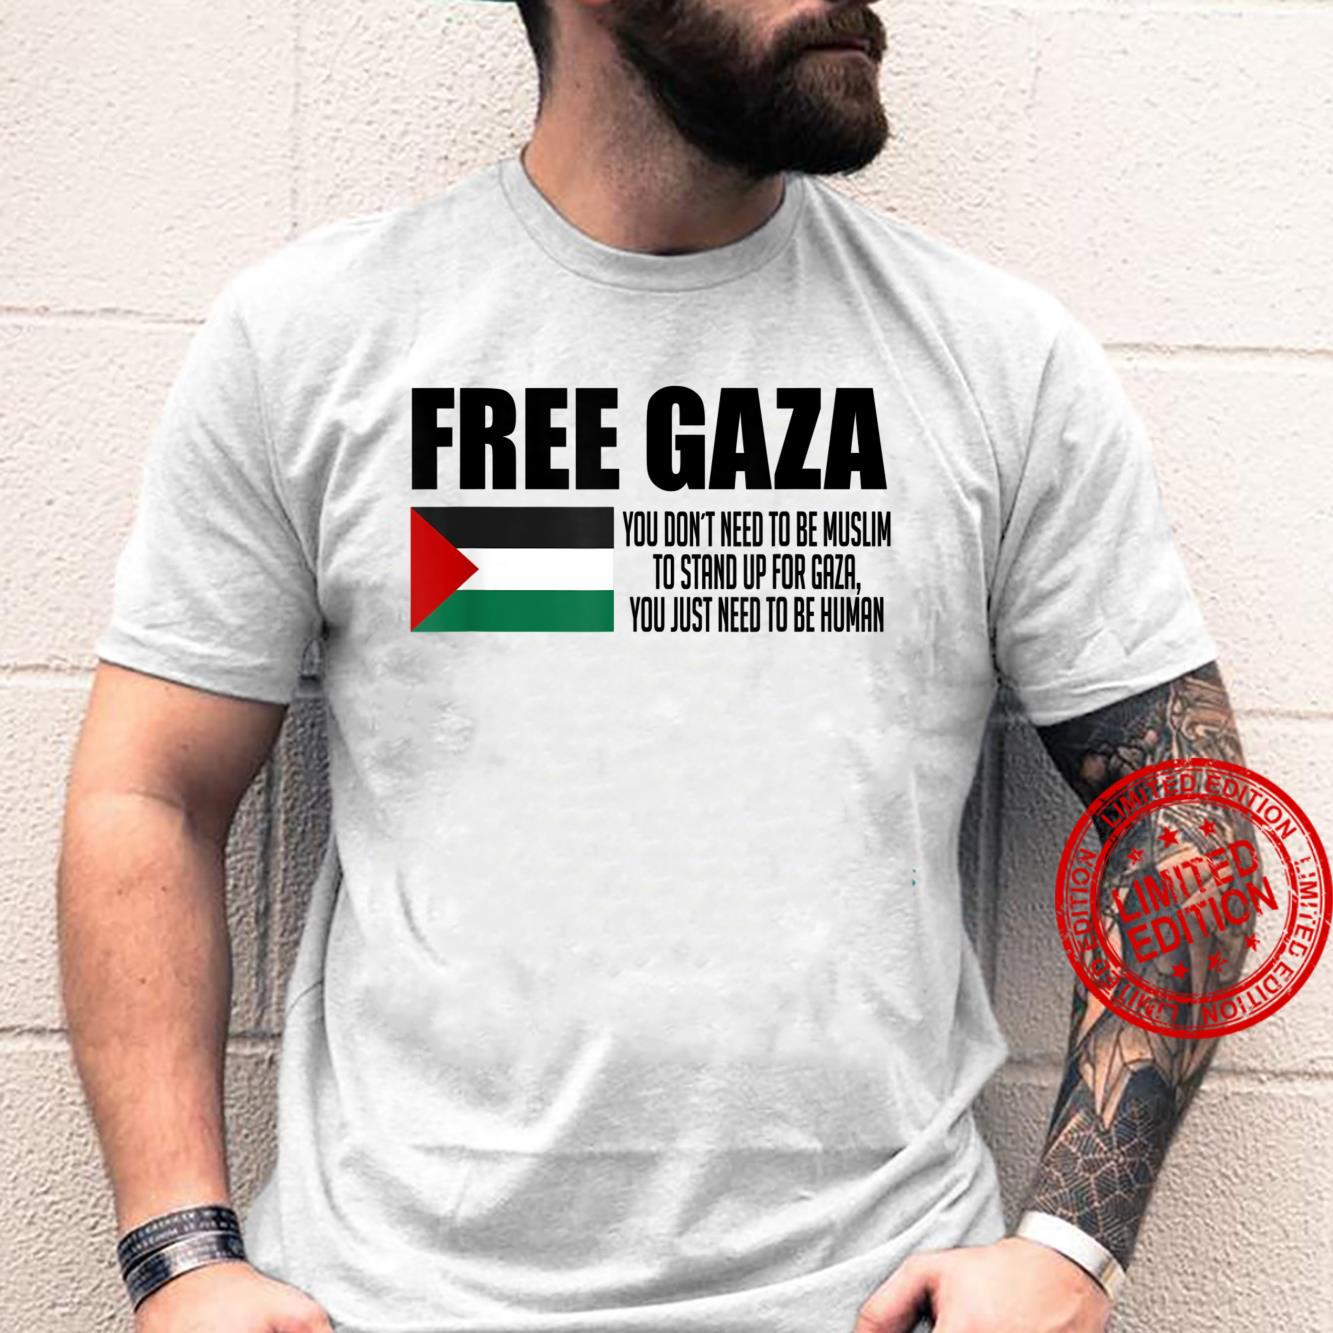 Save Gaza, Free Palestine, Free Gaza, Proud Gaza, Palestine Shirt